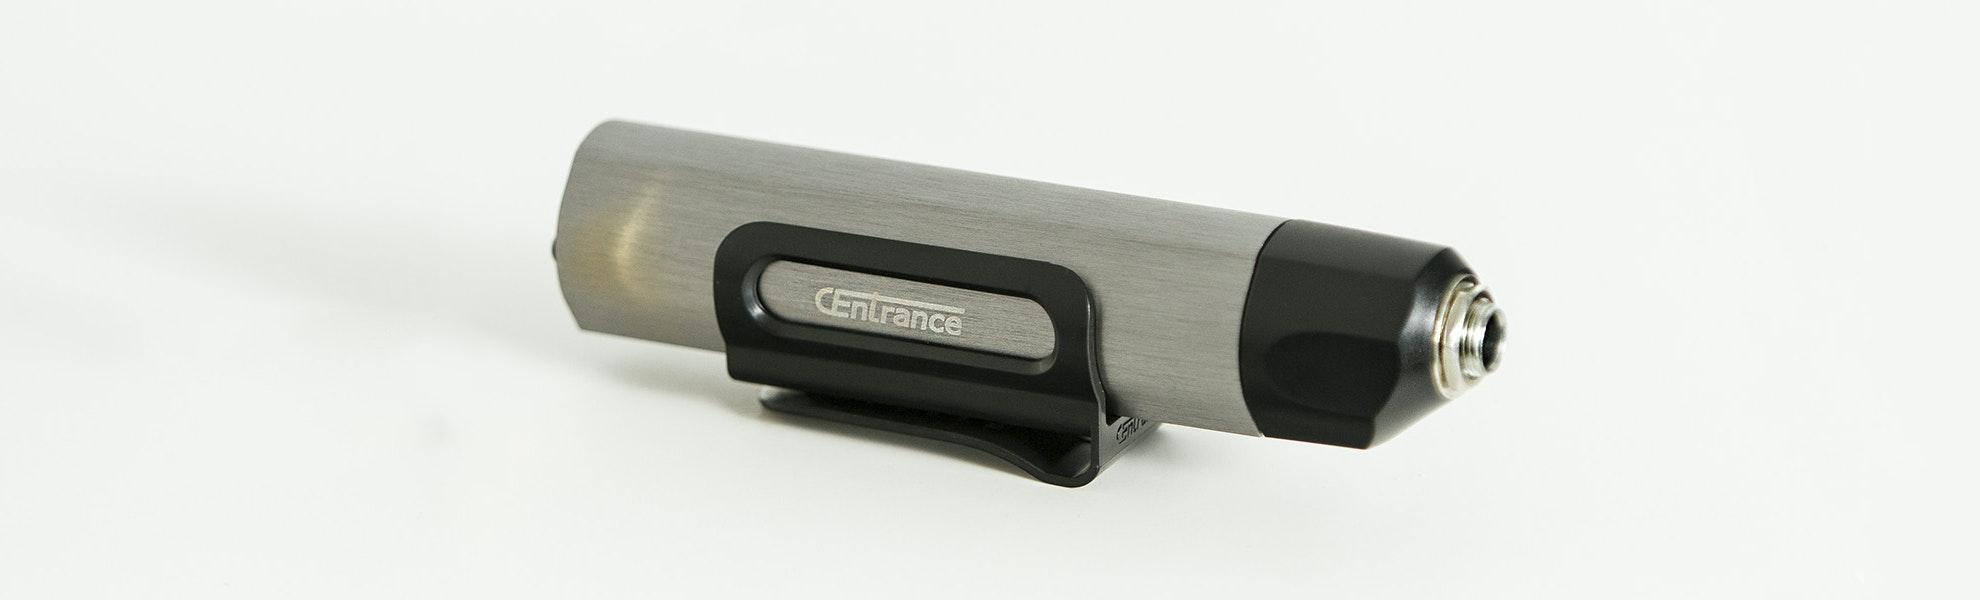 CEntrance DACport LX USB DAC